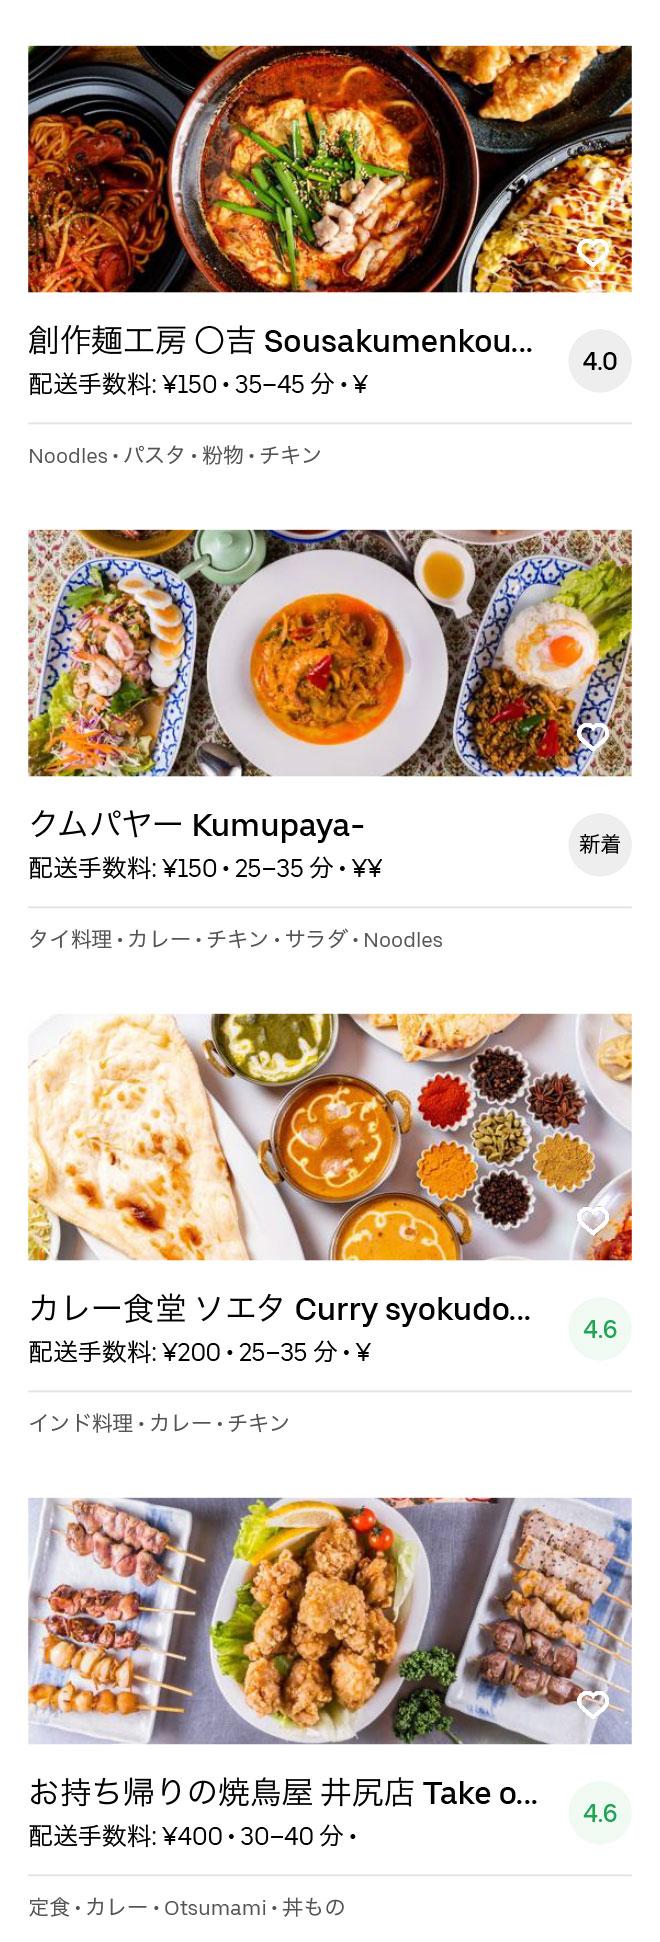 Kasuga hakataminami menu 2004 07